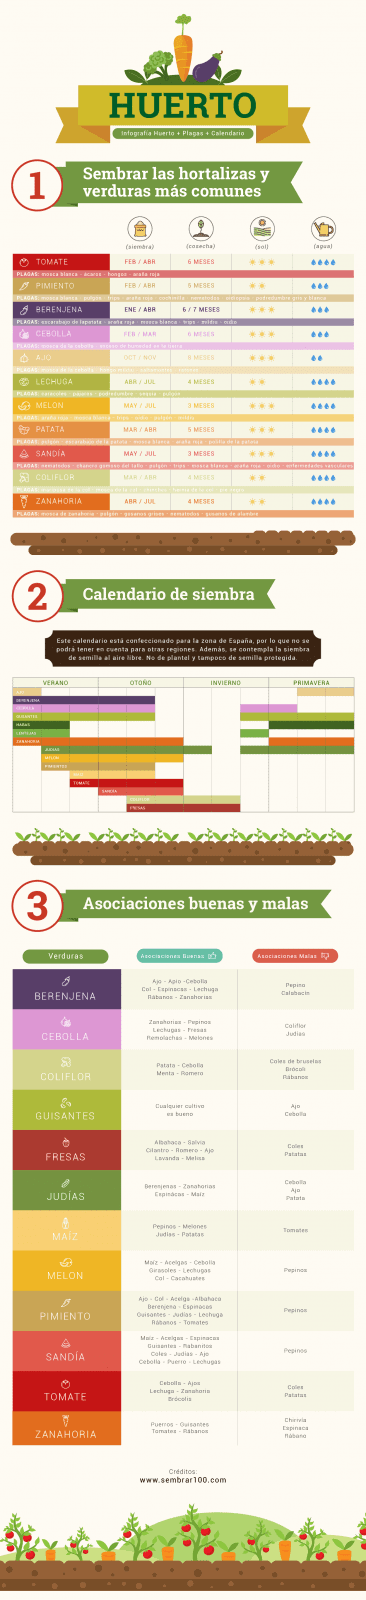 infografía sobre como hacer un huerto